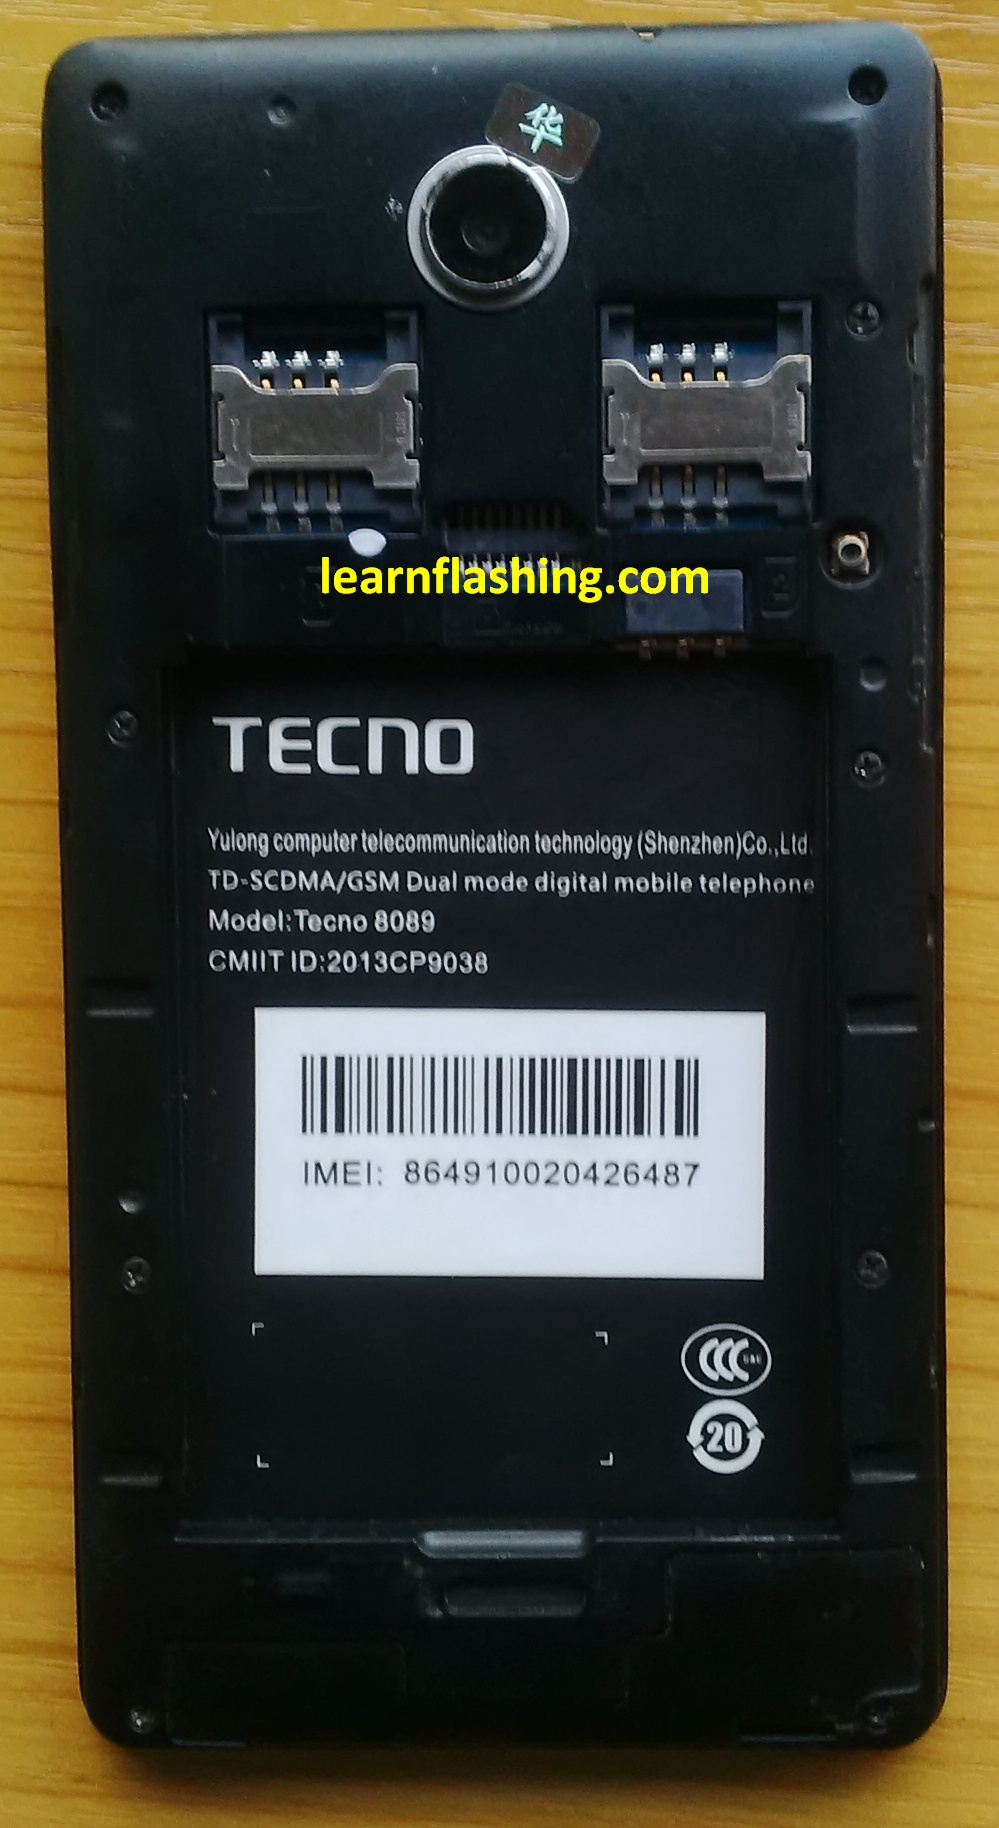 TECNO 8089 SC77XX STOCK ROM FIRMWARE (FLASH FILE) - Needromng